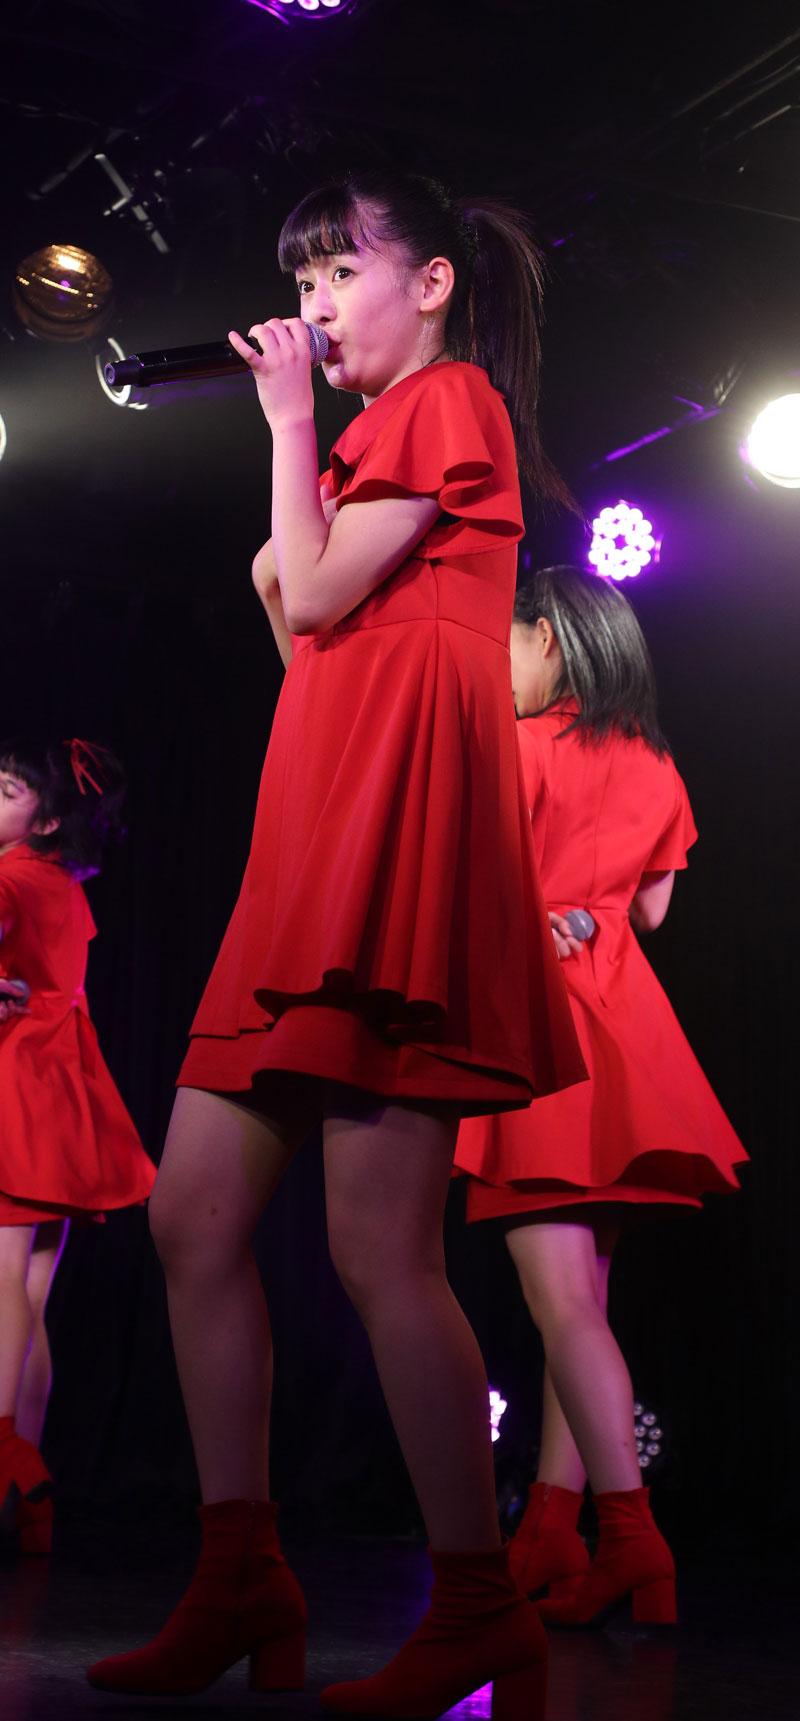 Images : 12番目の画像 - 7月30日にAKIBAカルチャーズ劇場で開催された「定期公演第七片」より - Stereo Sound ONLINE